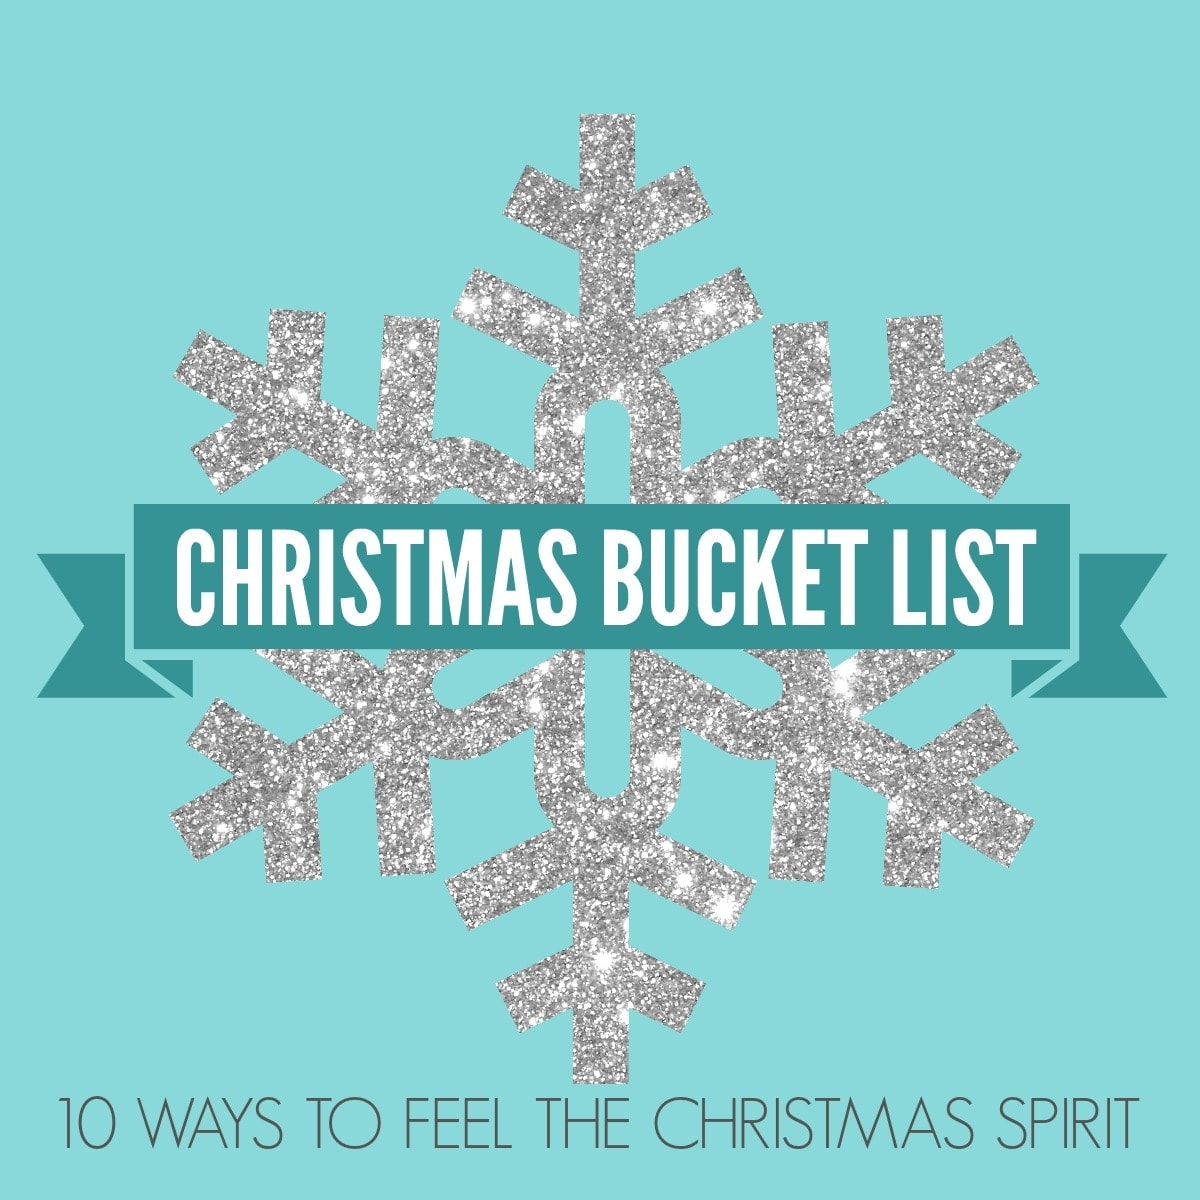 Christmas Bucket List. 10 Ways to Feel the Christmas Spirit by Modern Honey.